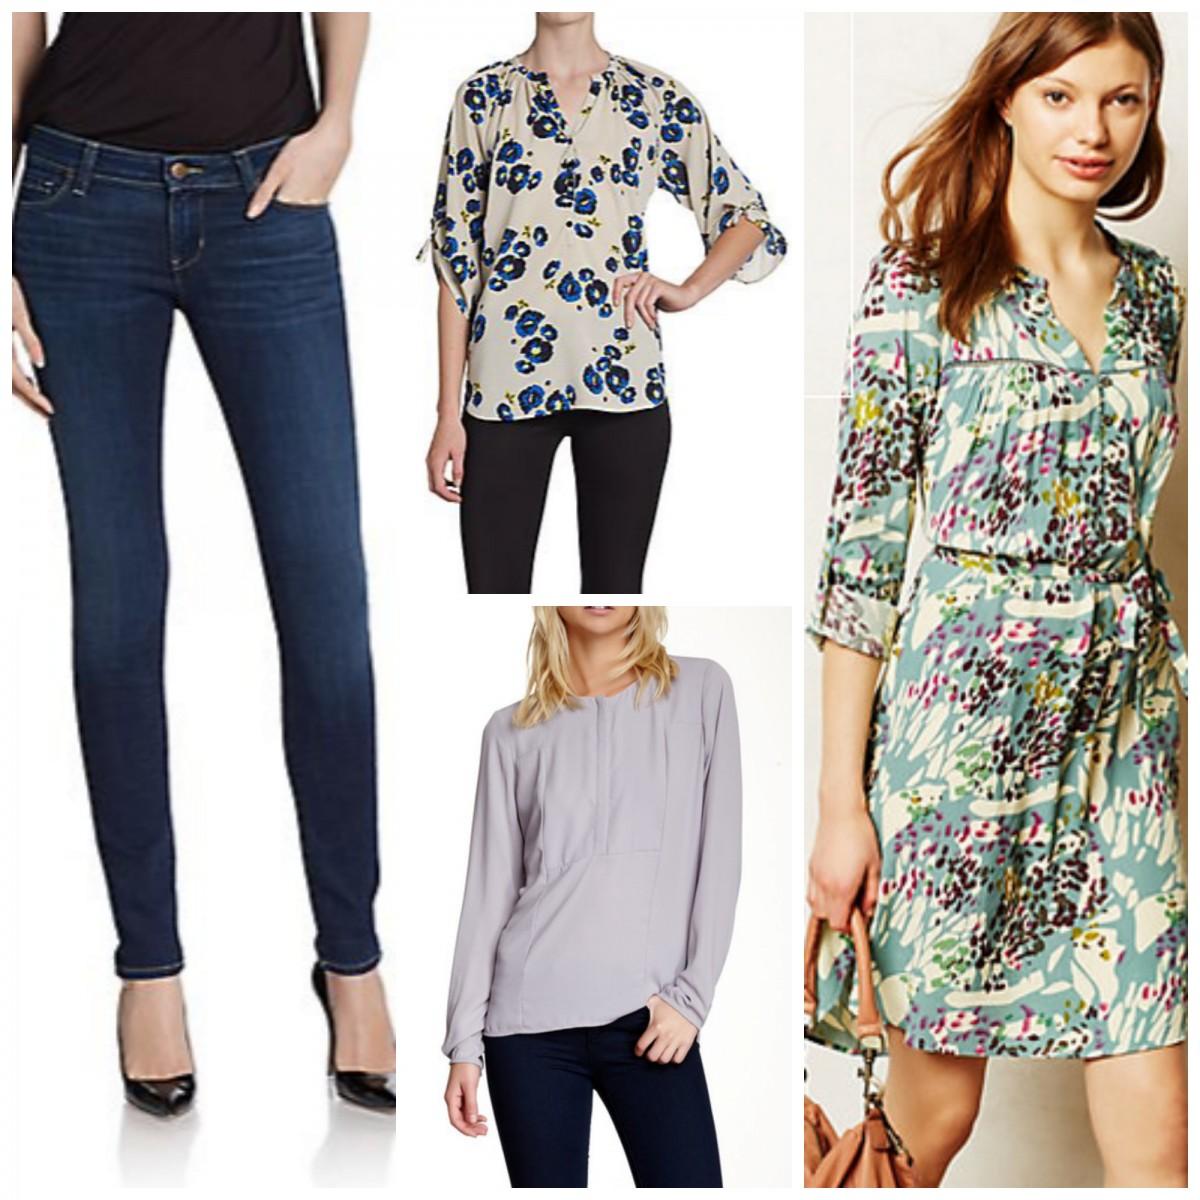 Fall Fashion Favorites Jeans Blouse Dress Her Heartland Soul Erin Fairchild